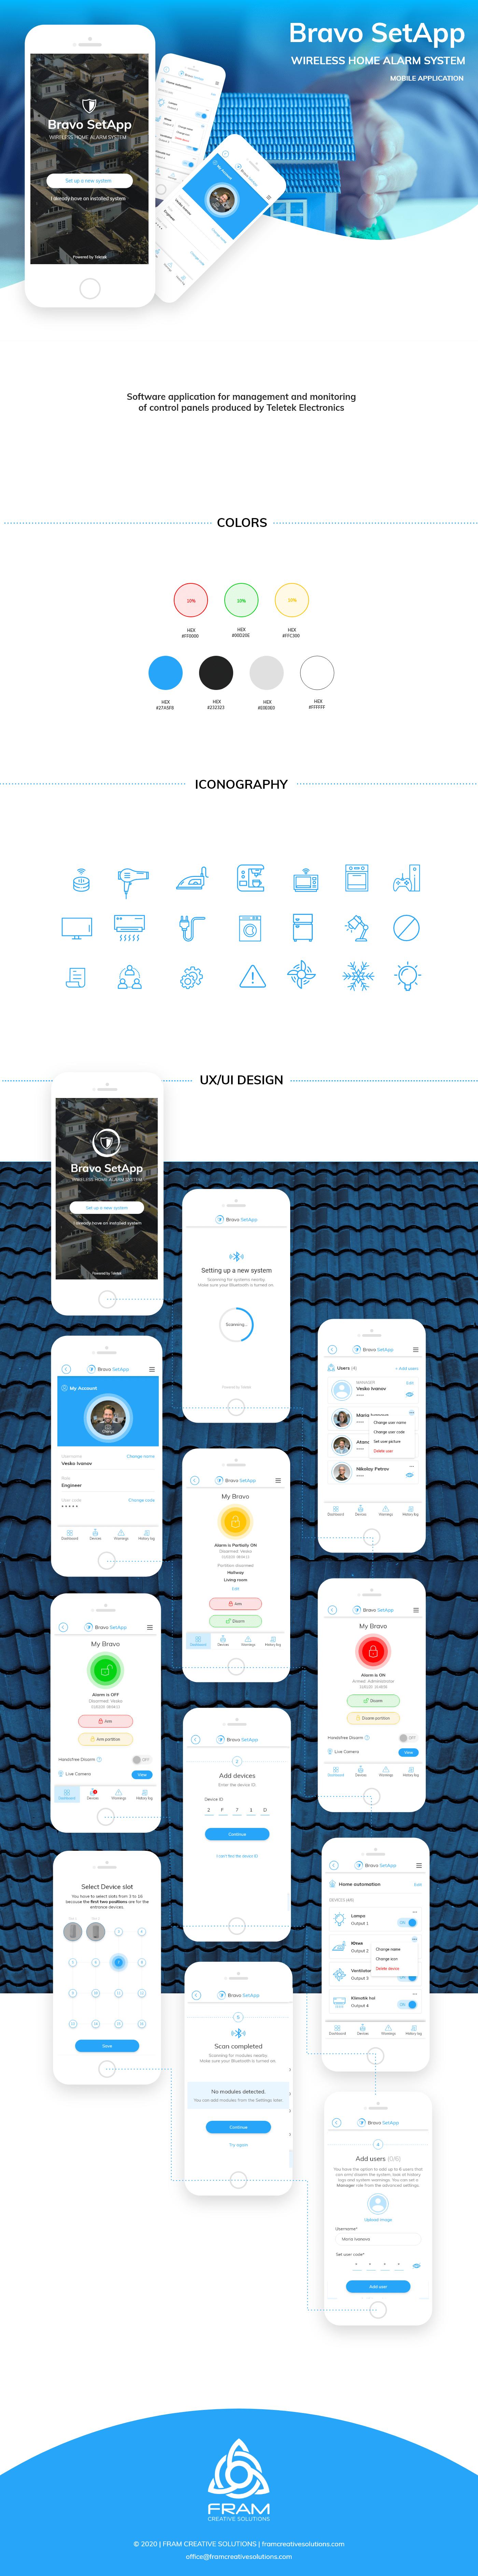 mobiledesign UI ux ux/ui